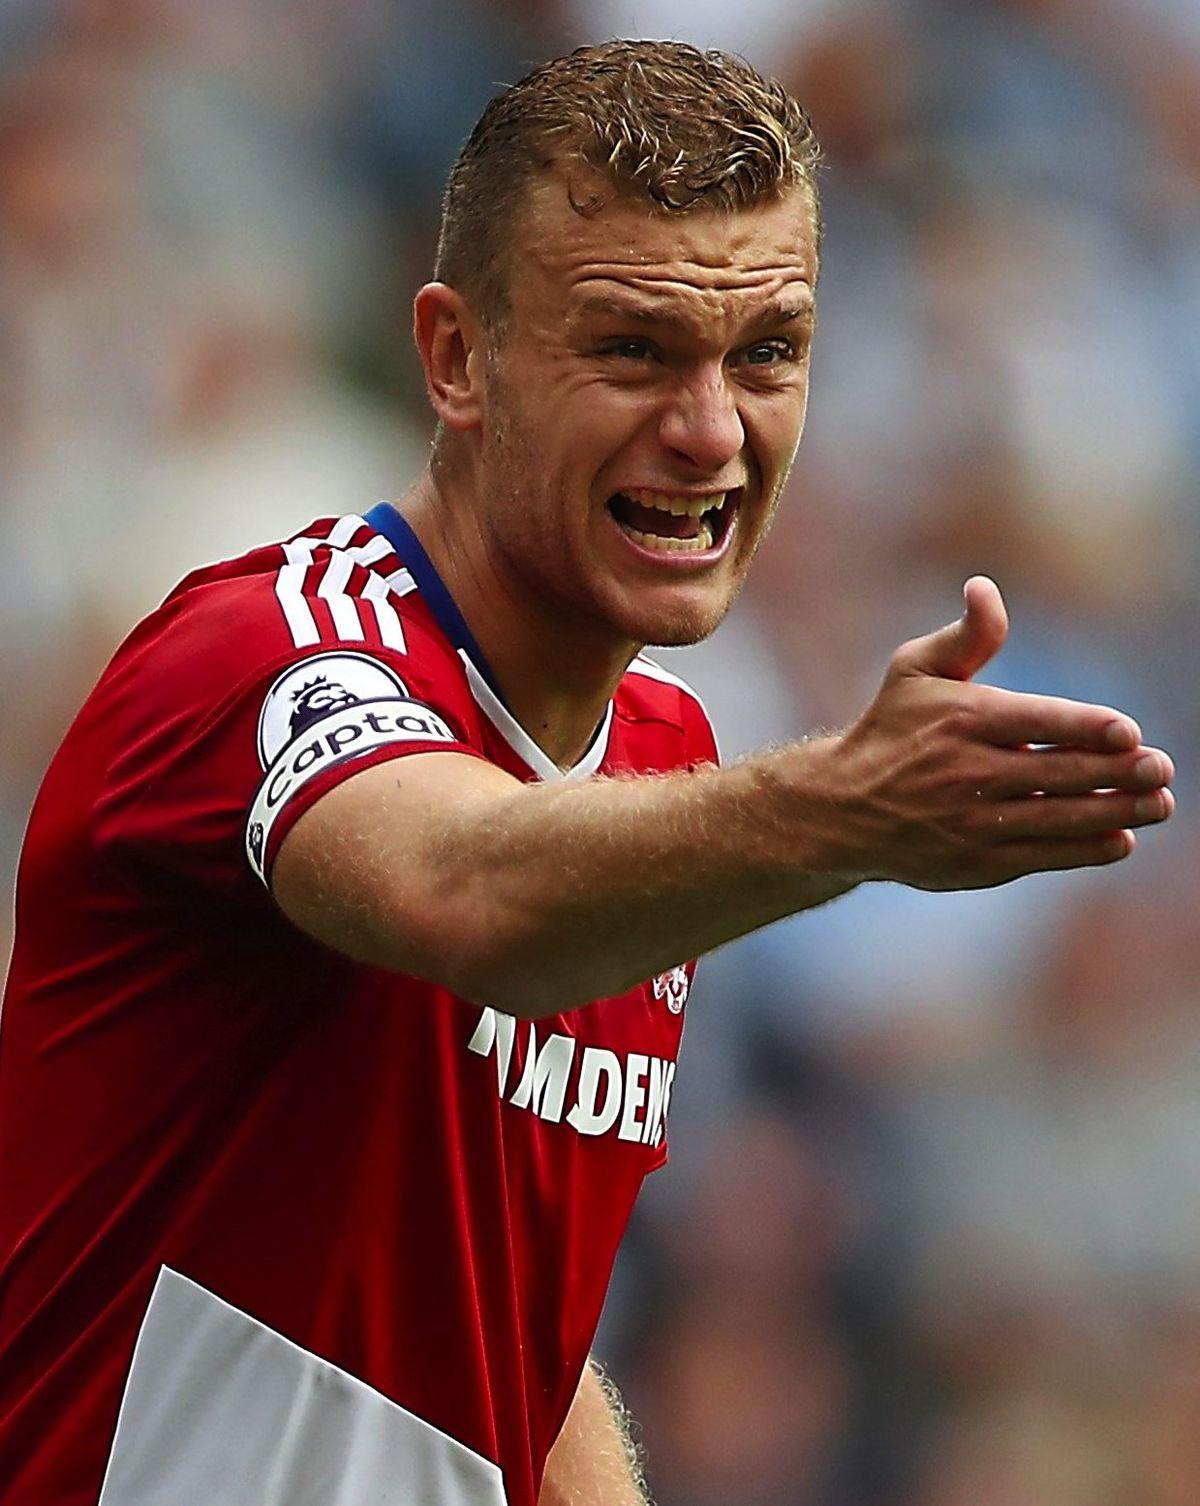 £21m bid: Ben Gibson